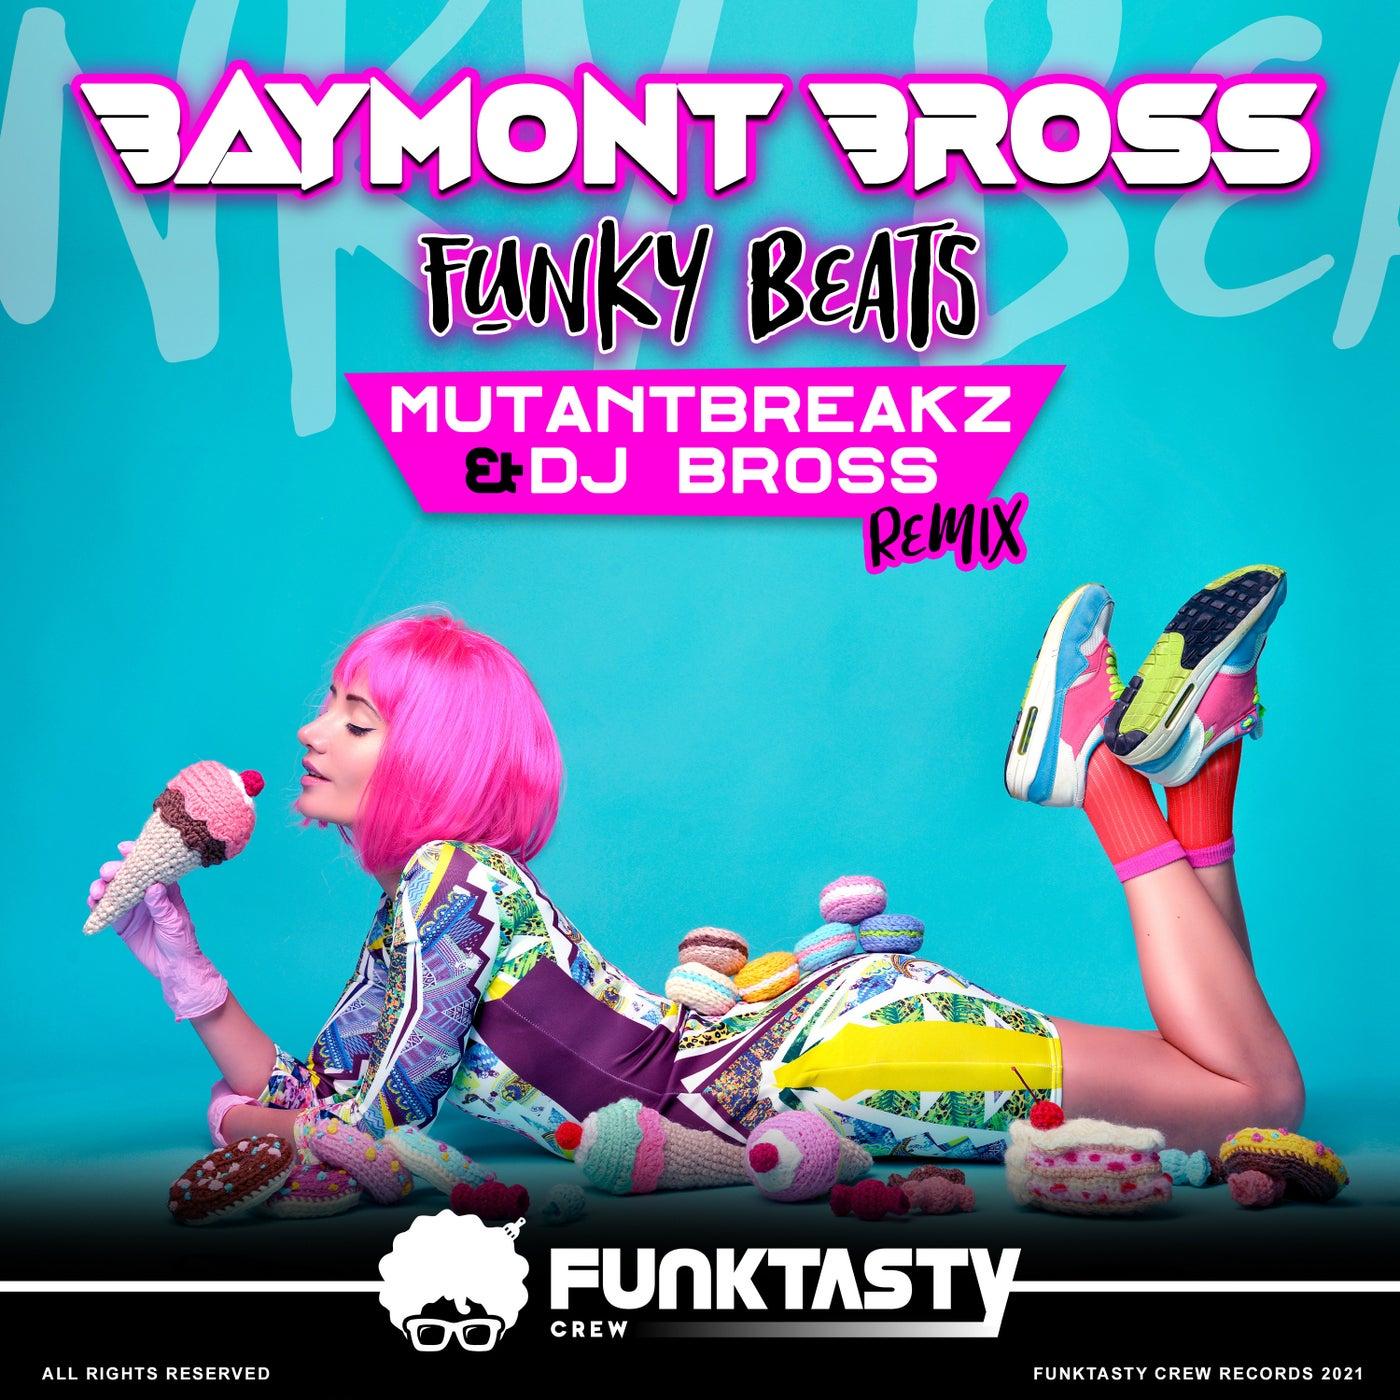 Funky Beats (Mutantbreakz & Dj Bross Remix)